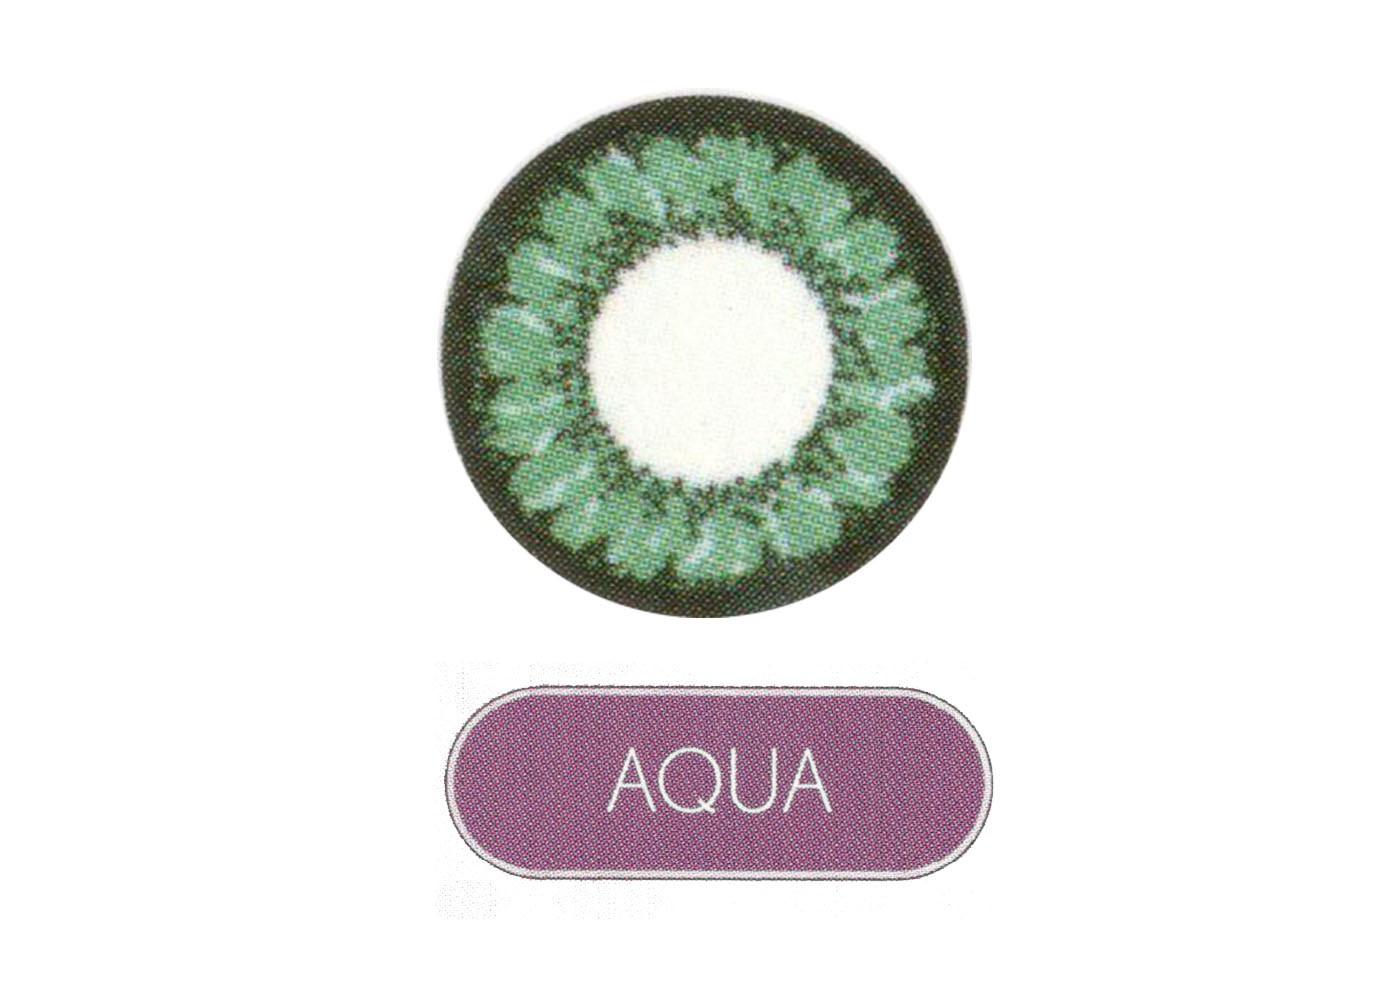 Lacelle Circle Monthly Disposable (2 Lens Box) Aqua